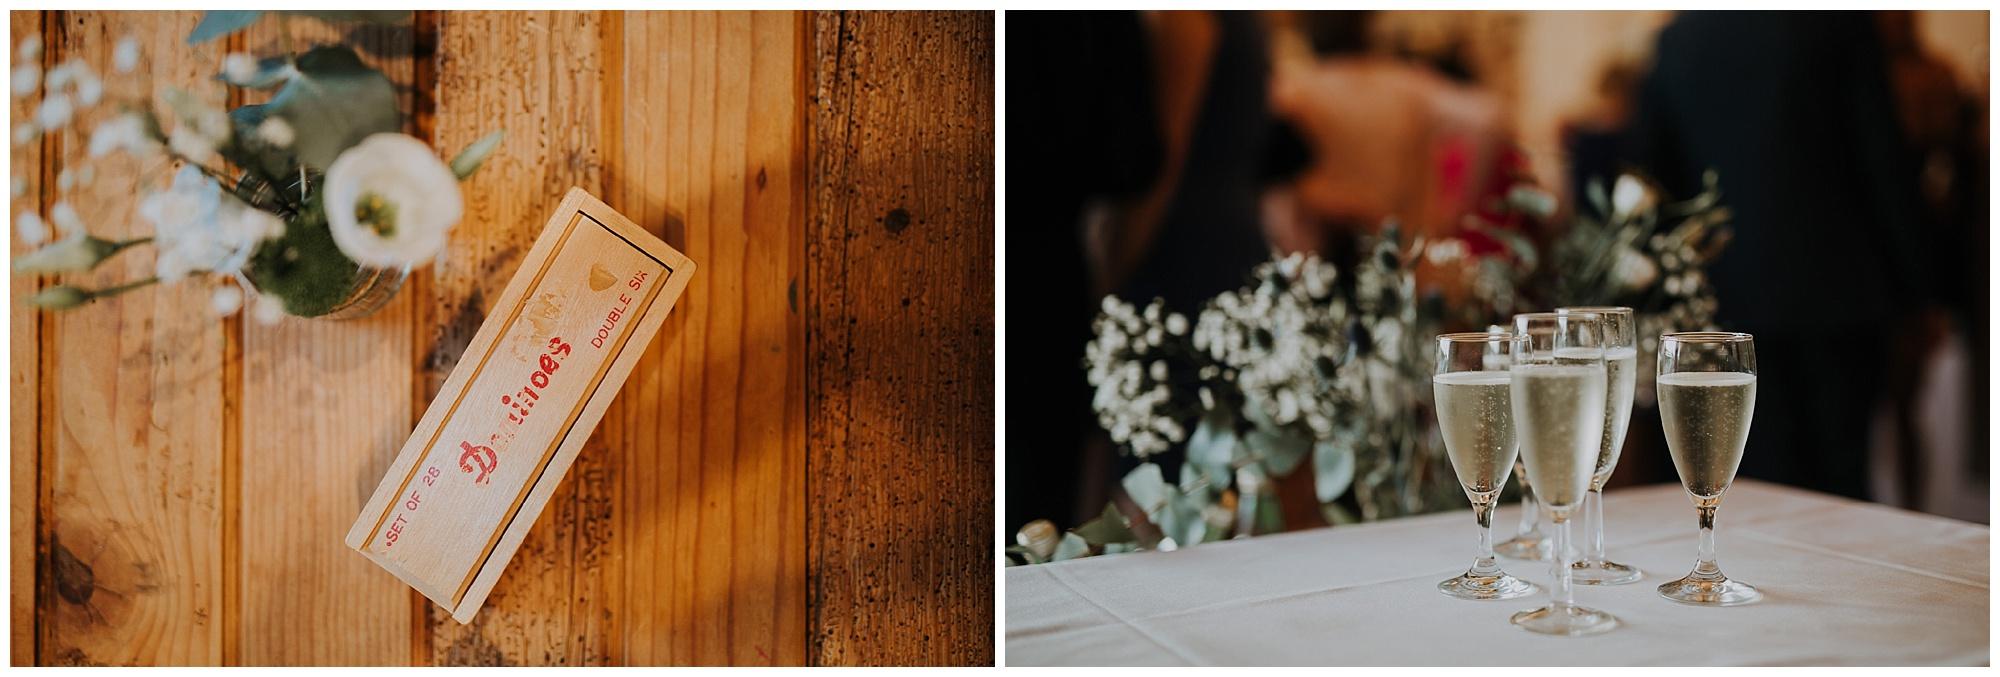 vintage dominoes set and florals